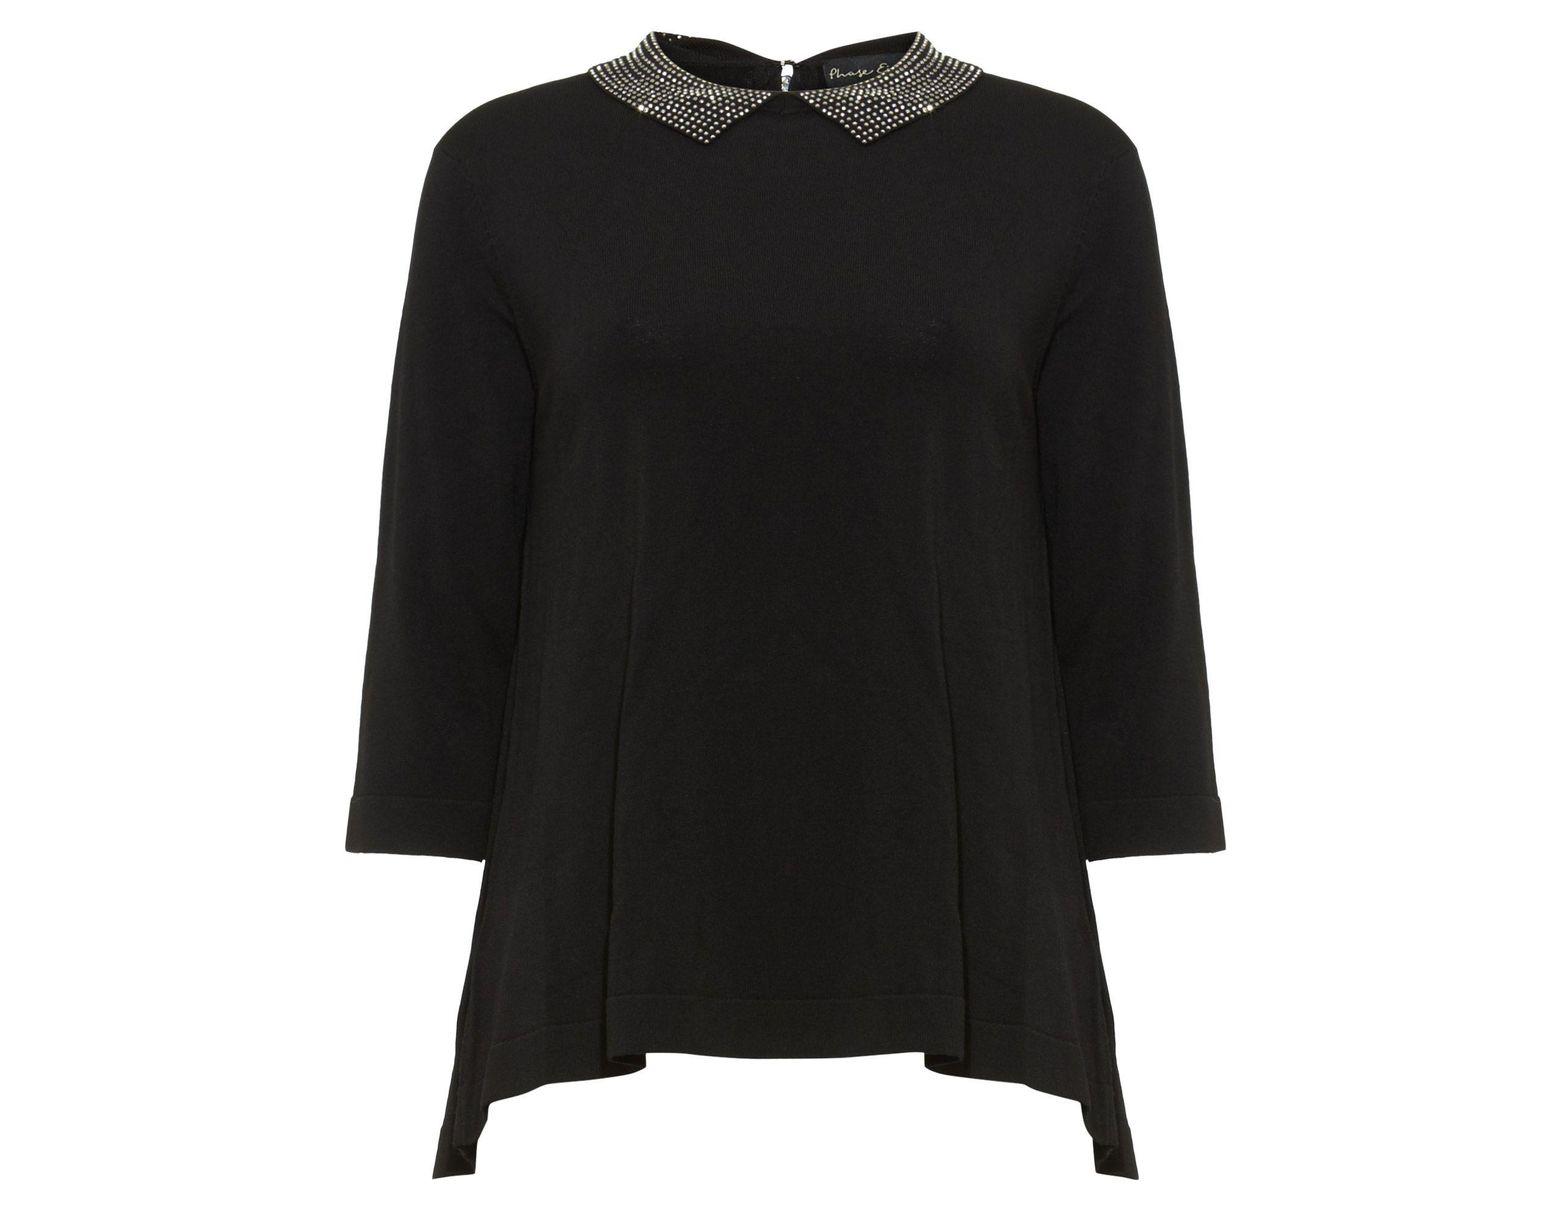 d5675f67a2f Women's Black Eliora Embellished Collar Knit Jumper